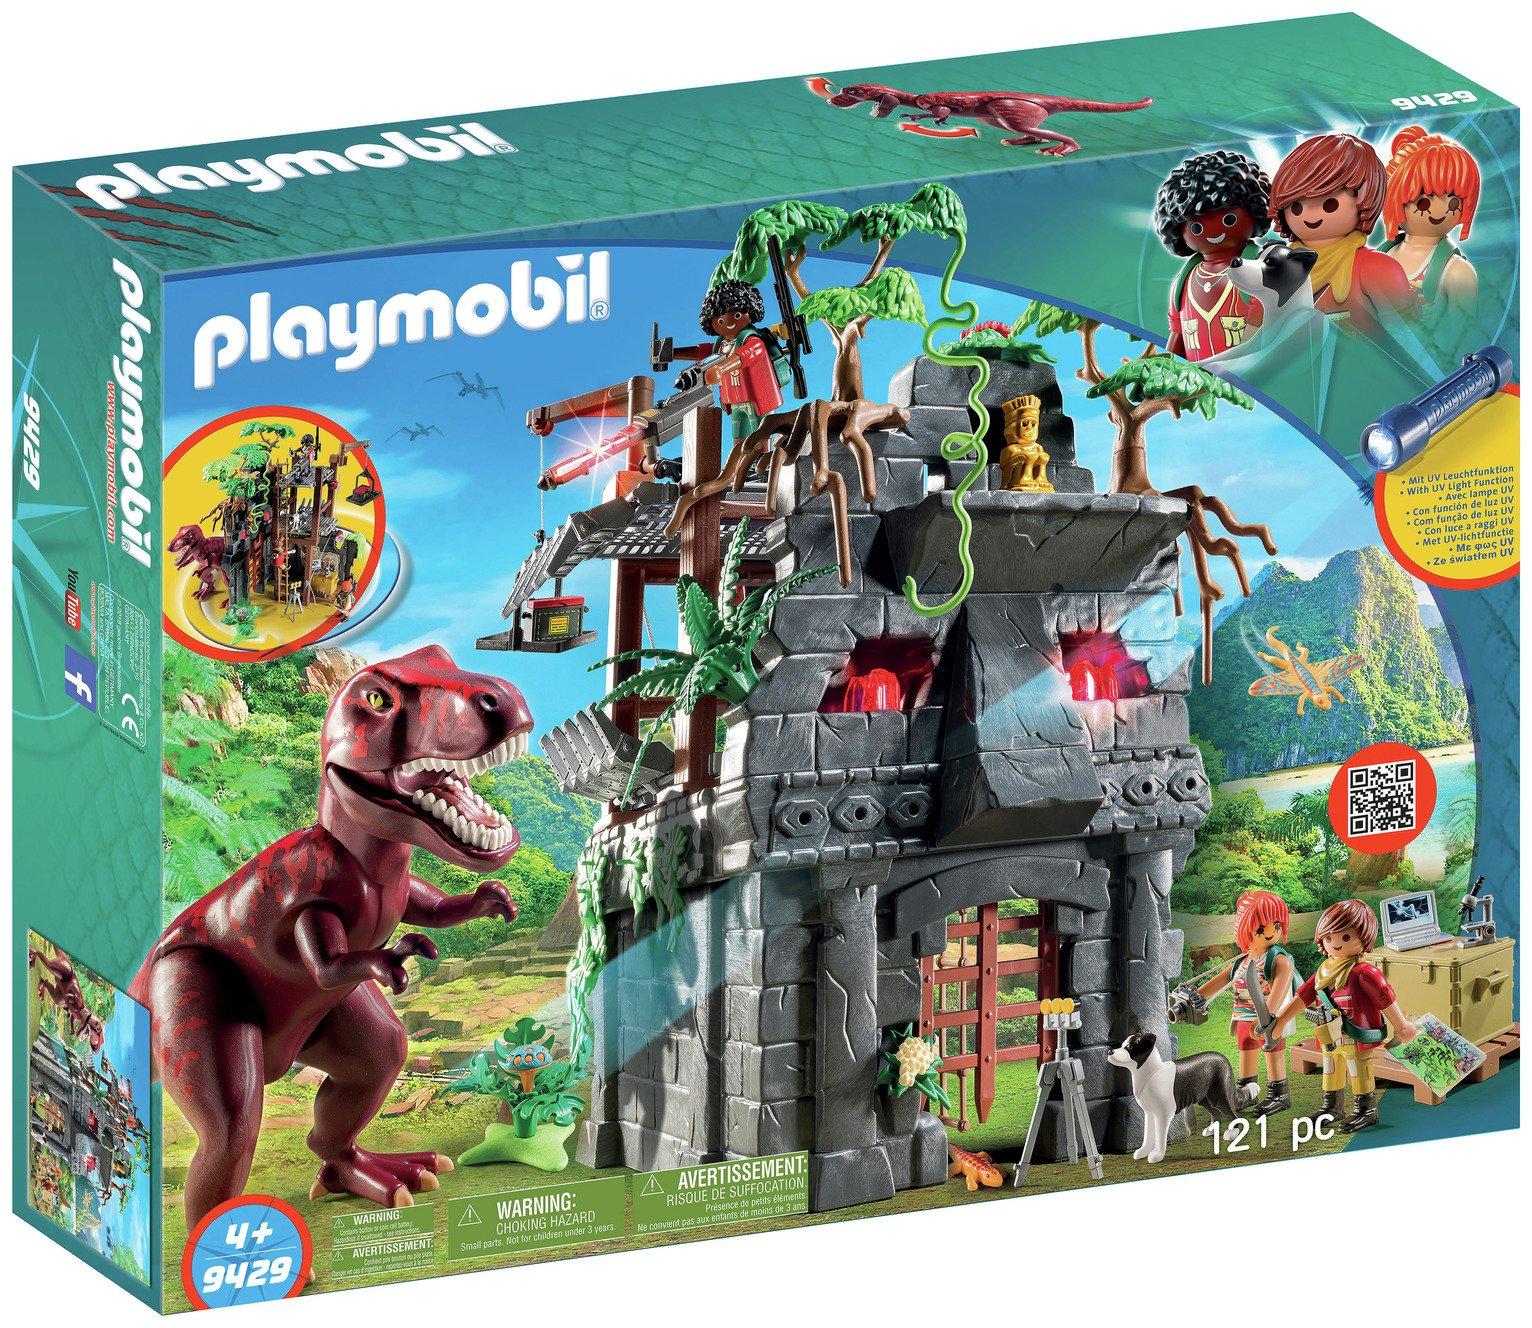 Playmobil 9429 Dinos Hidden Temple With T Rex